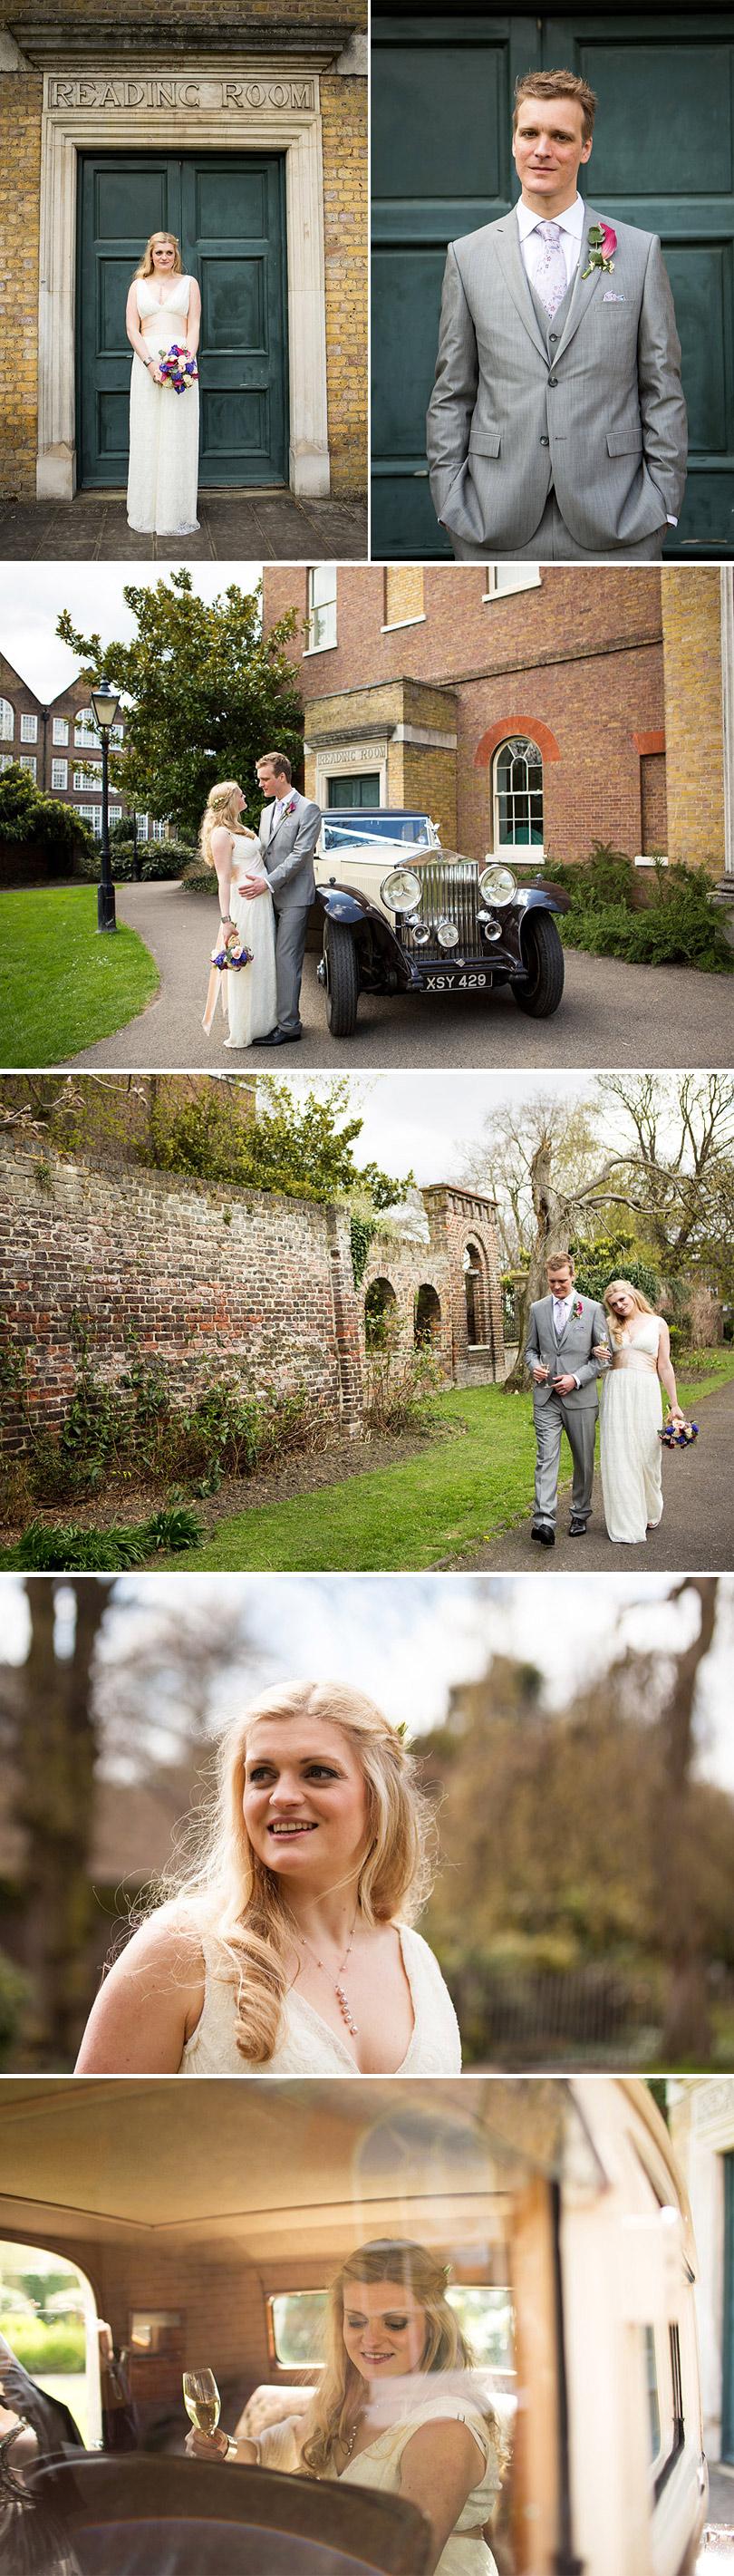 PM-Gallery-Ealing-Wedding-6.jpg